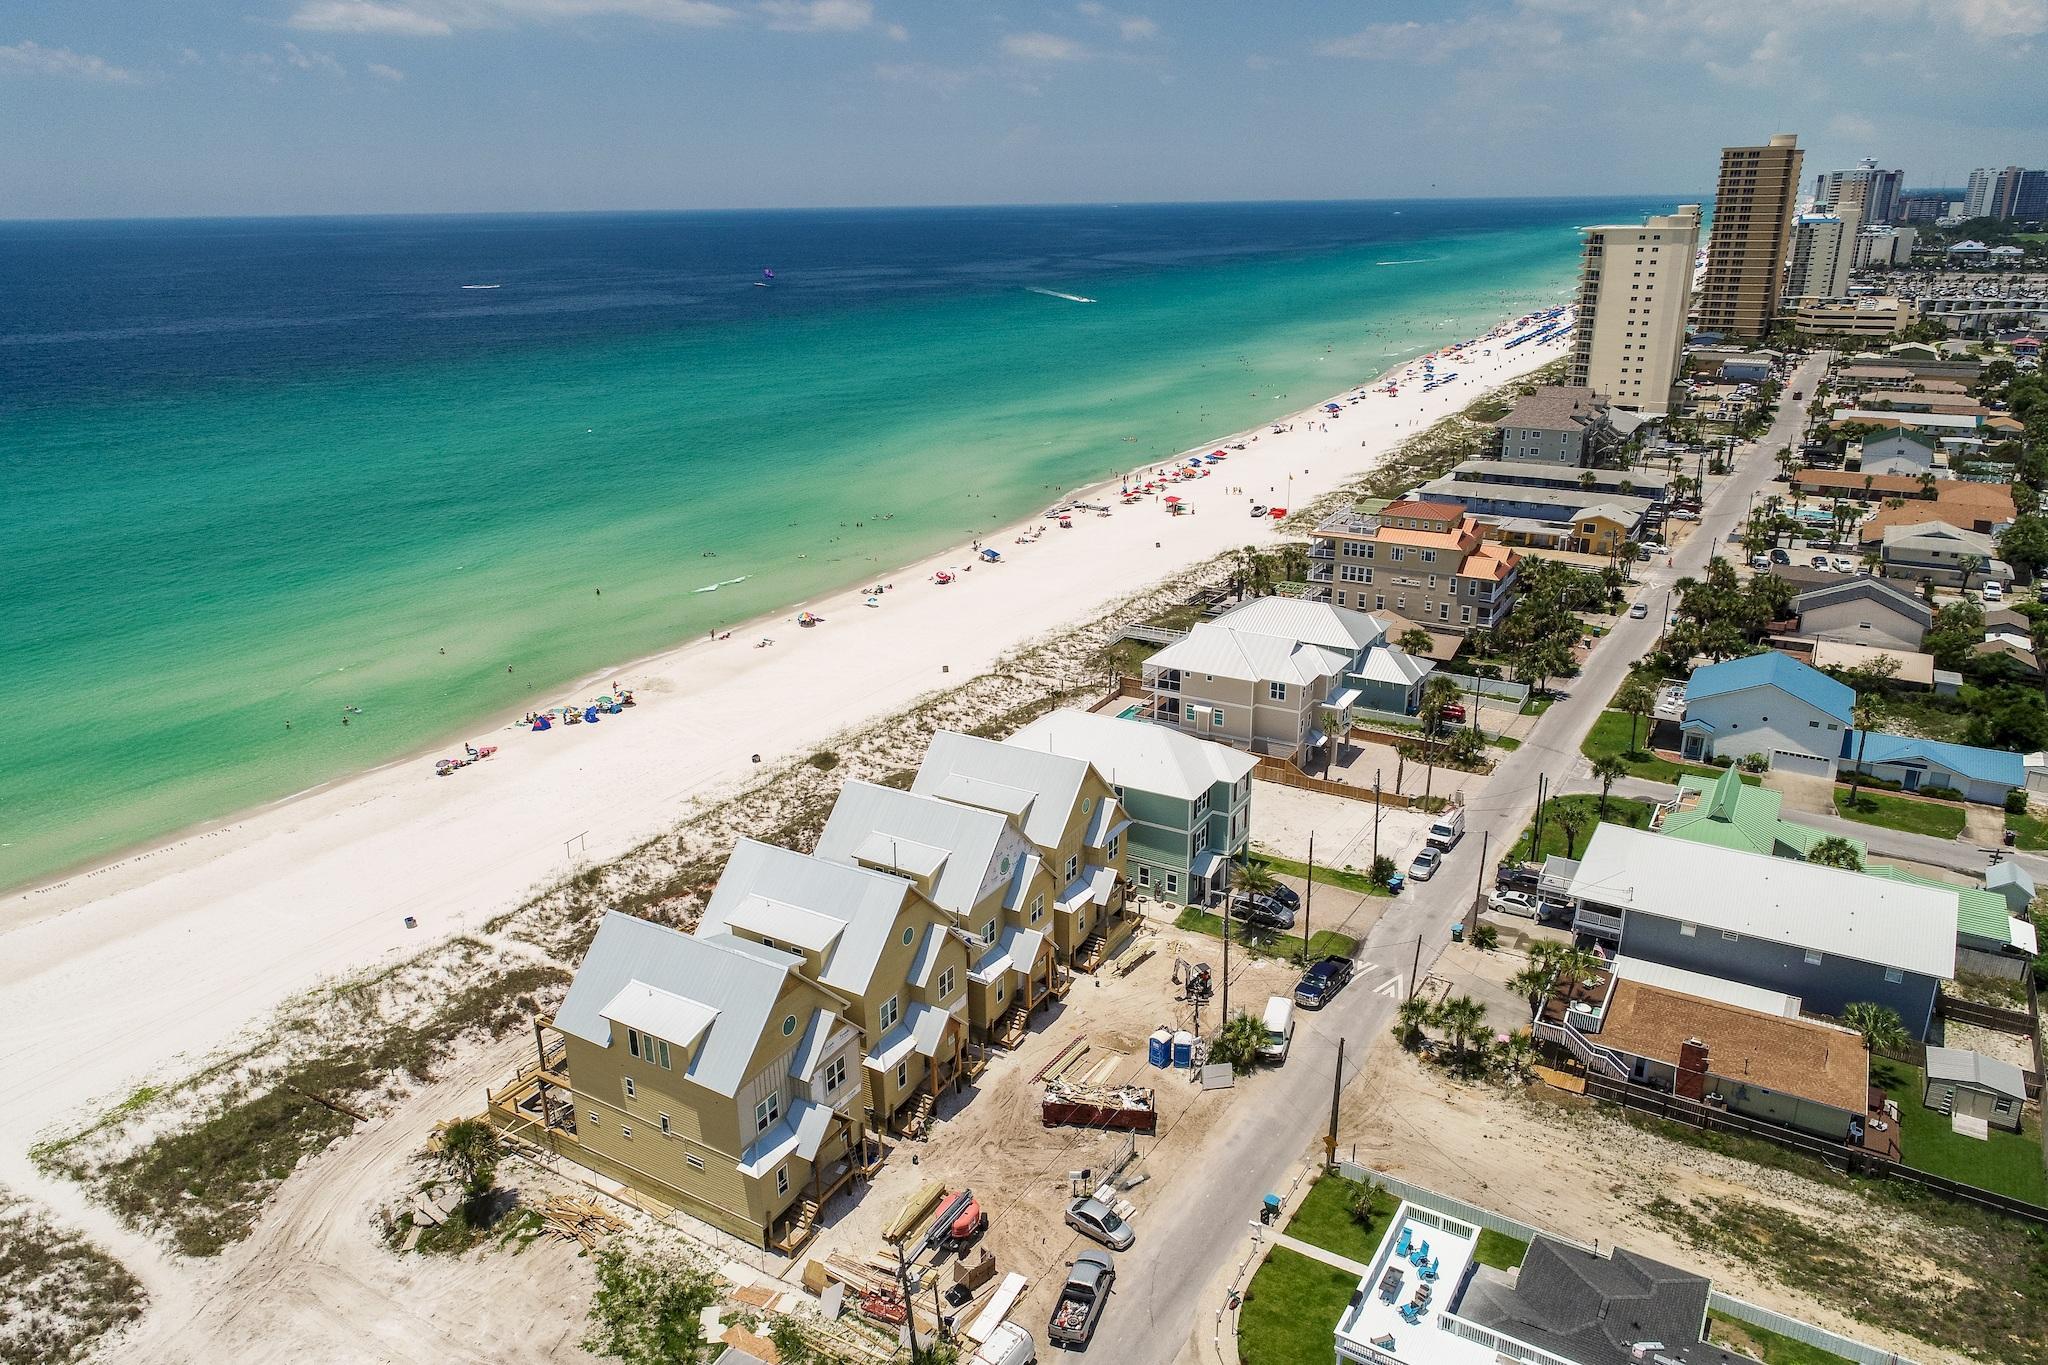 8321 SURF DRIVE, PANAMA CITY BEACH, FL 32408